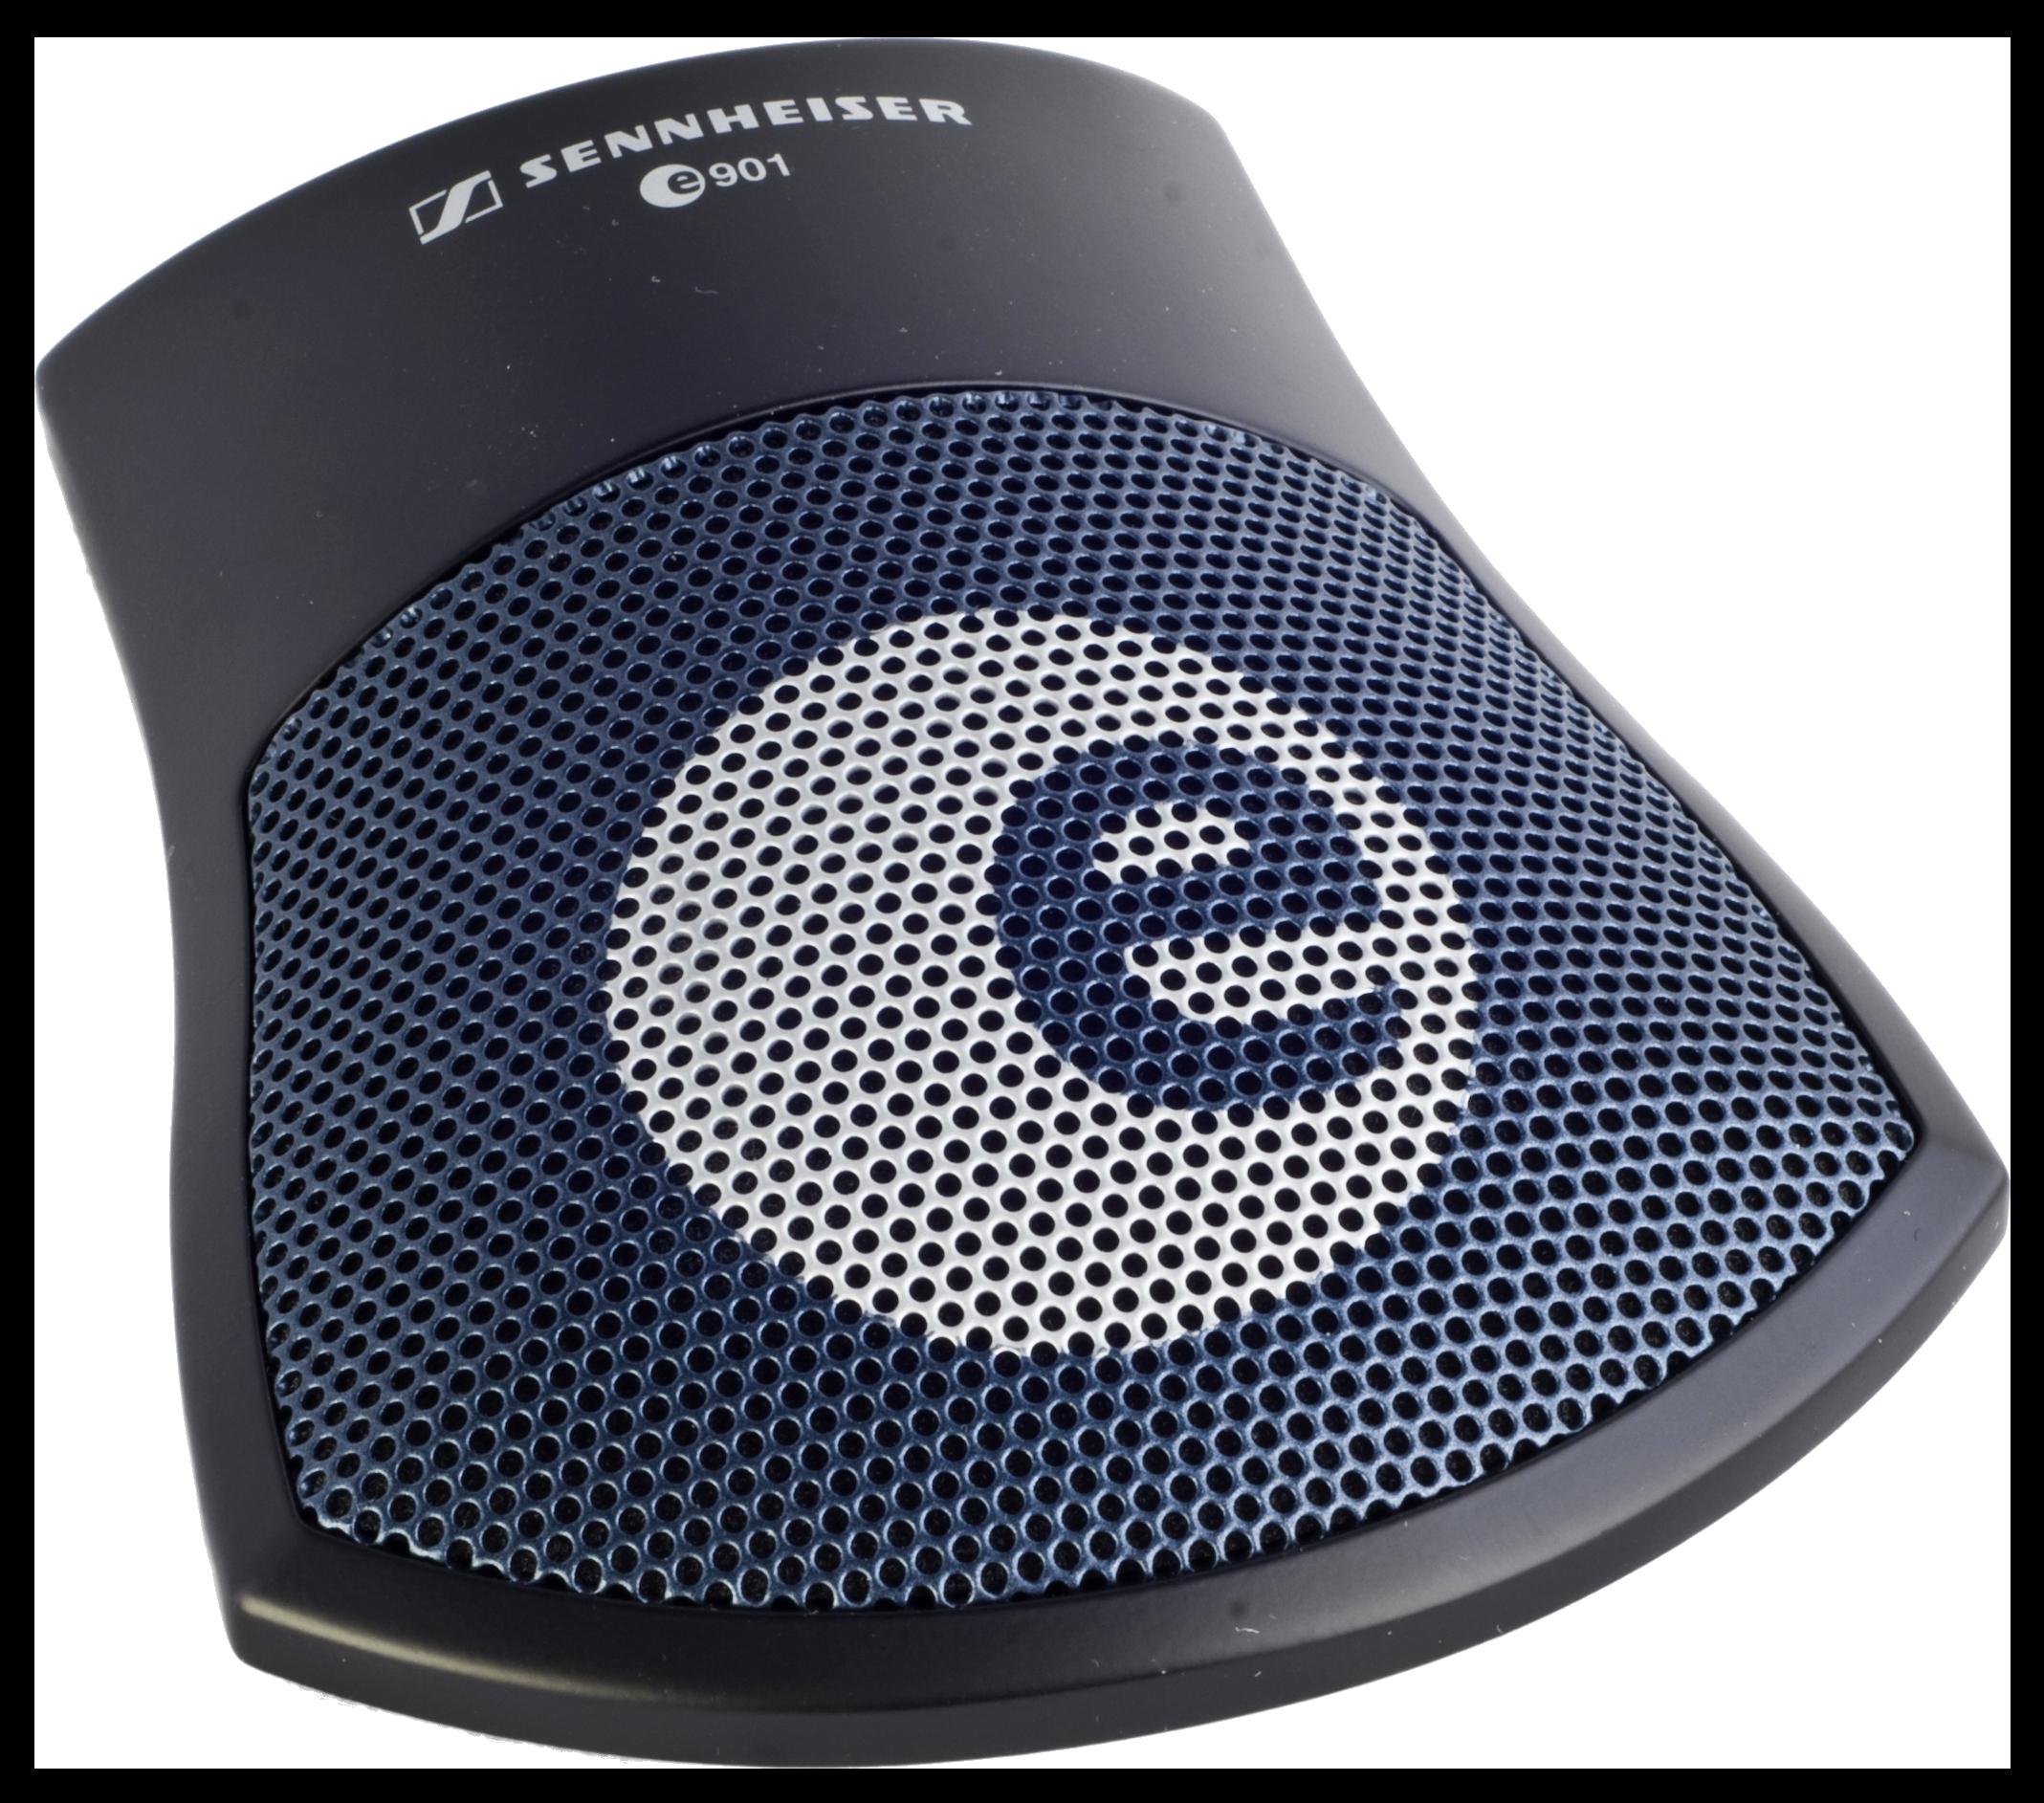 e901 microphone by sennheiser for rent apex sound light corporation. Black Bedroom Furniture Sets. Home Design Ideas